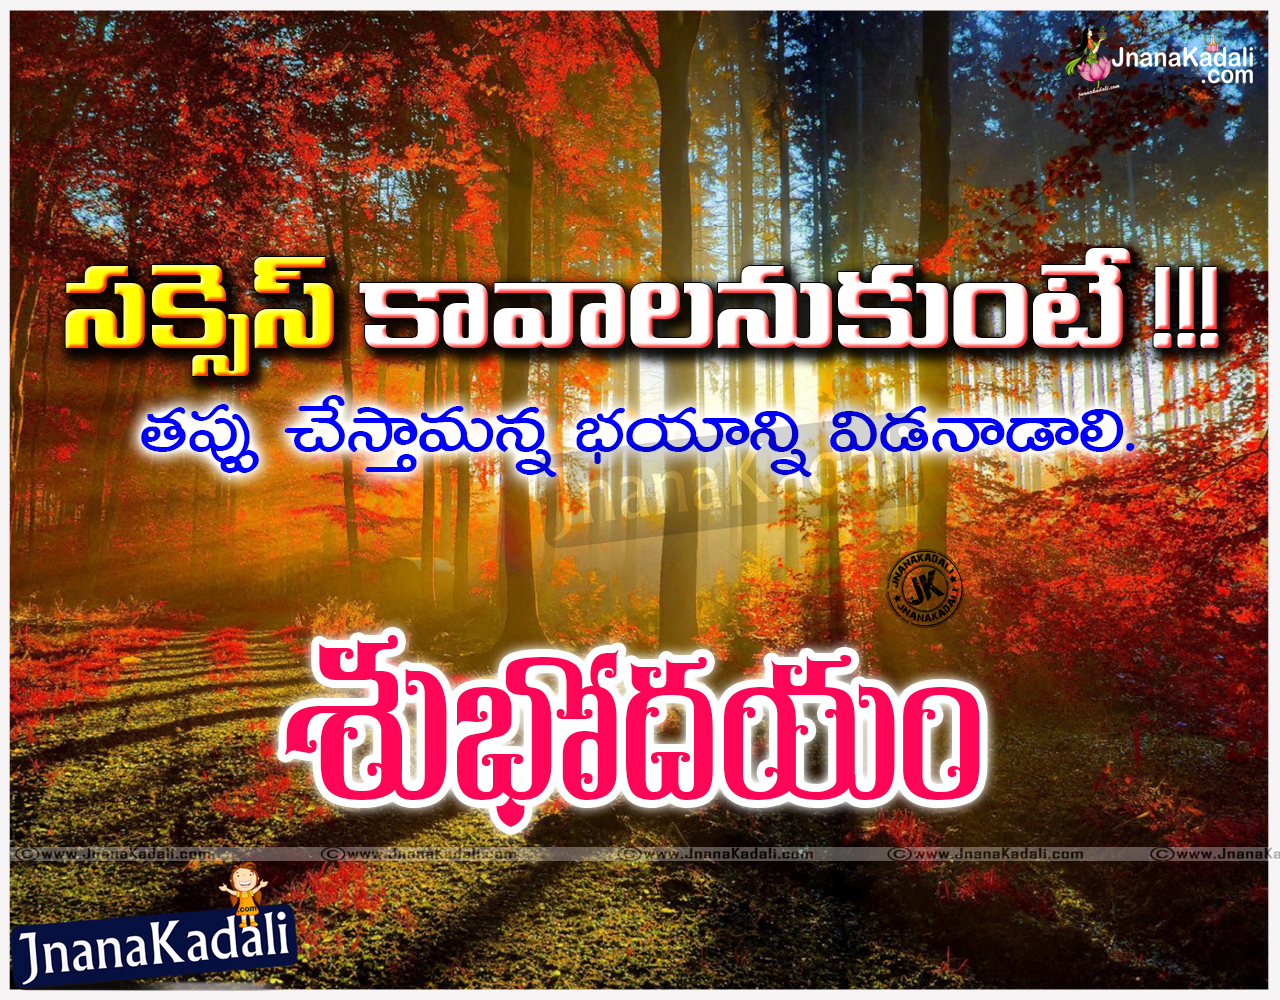 Inspirational Telugu Good Morning Quotes Hd Wallpapers Jnana